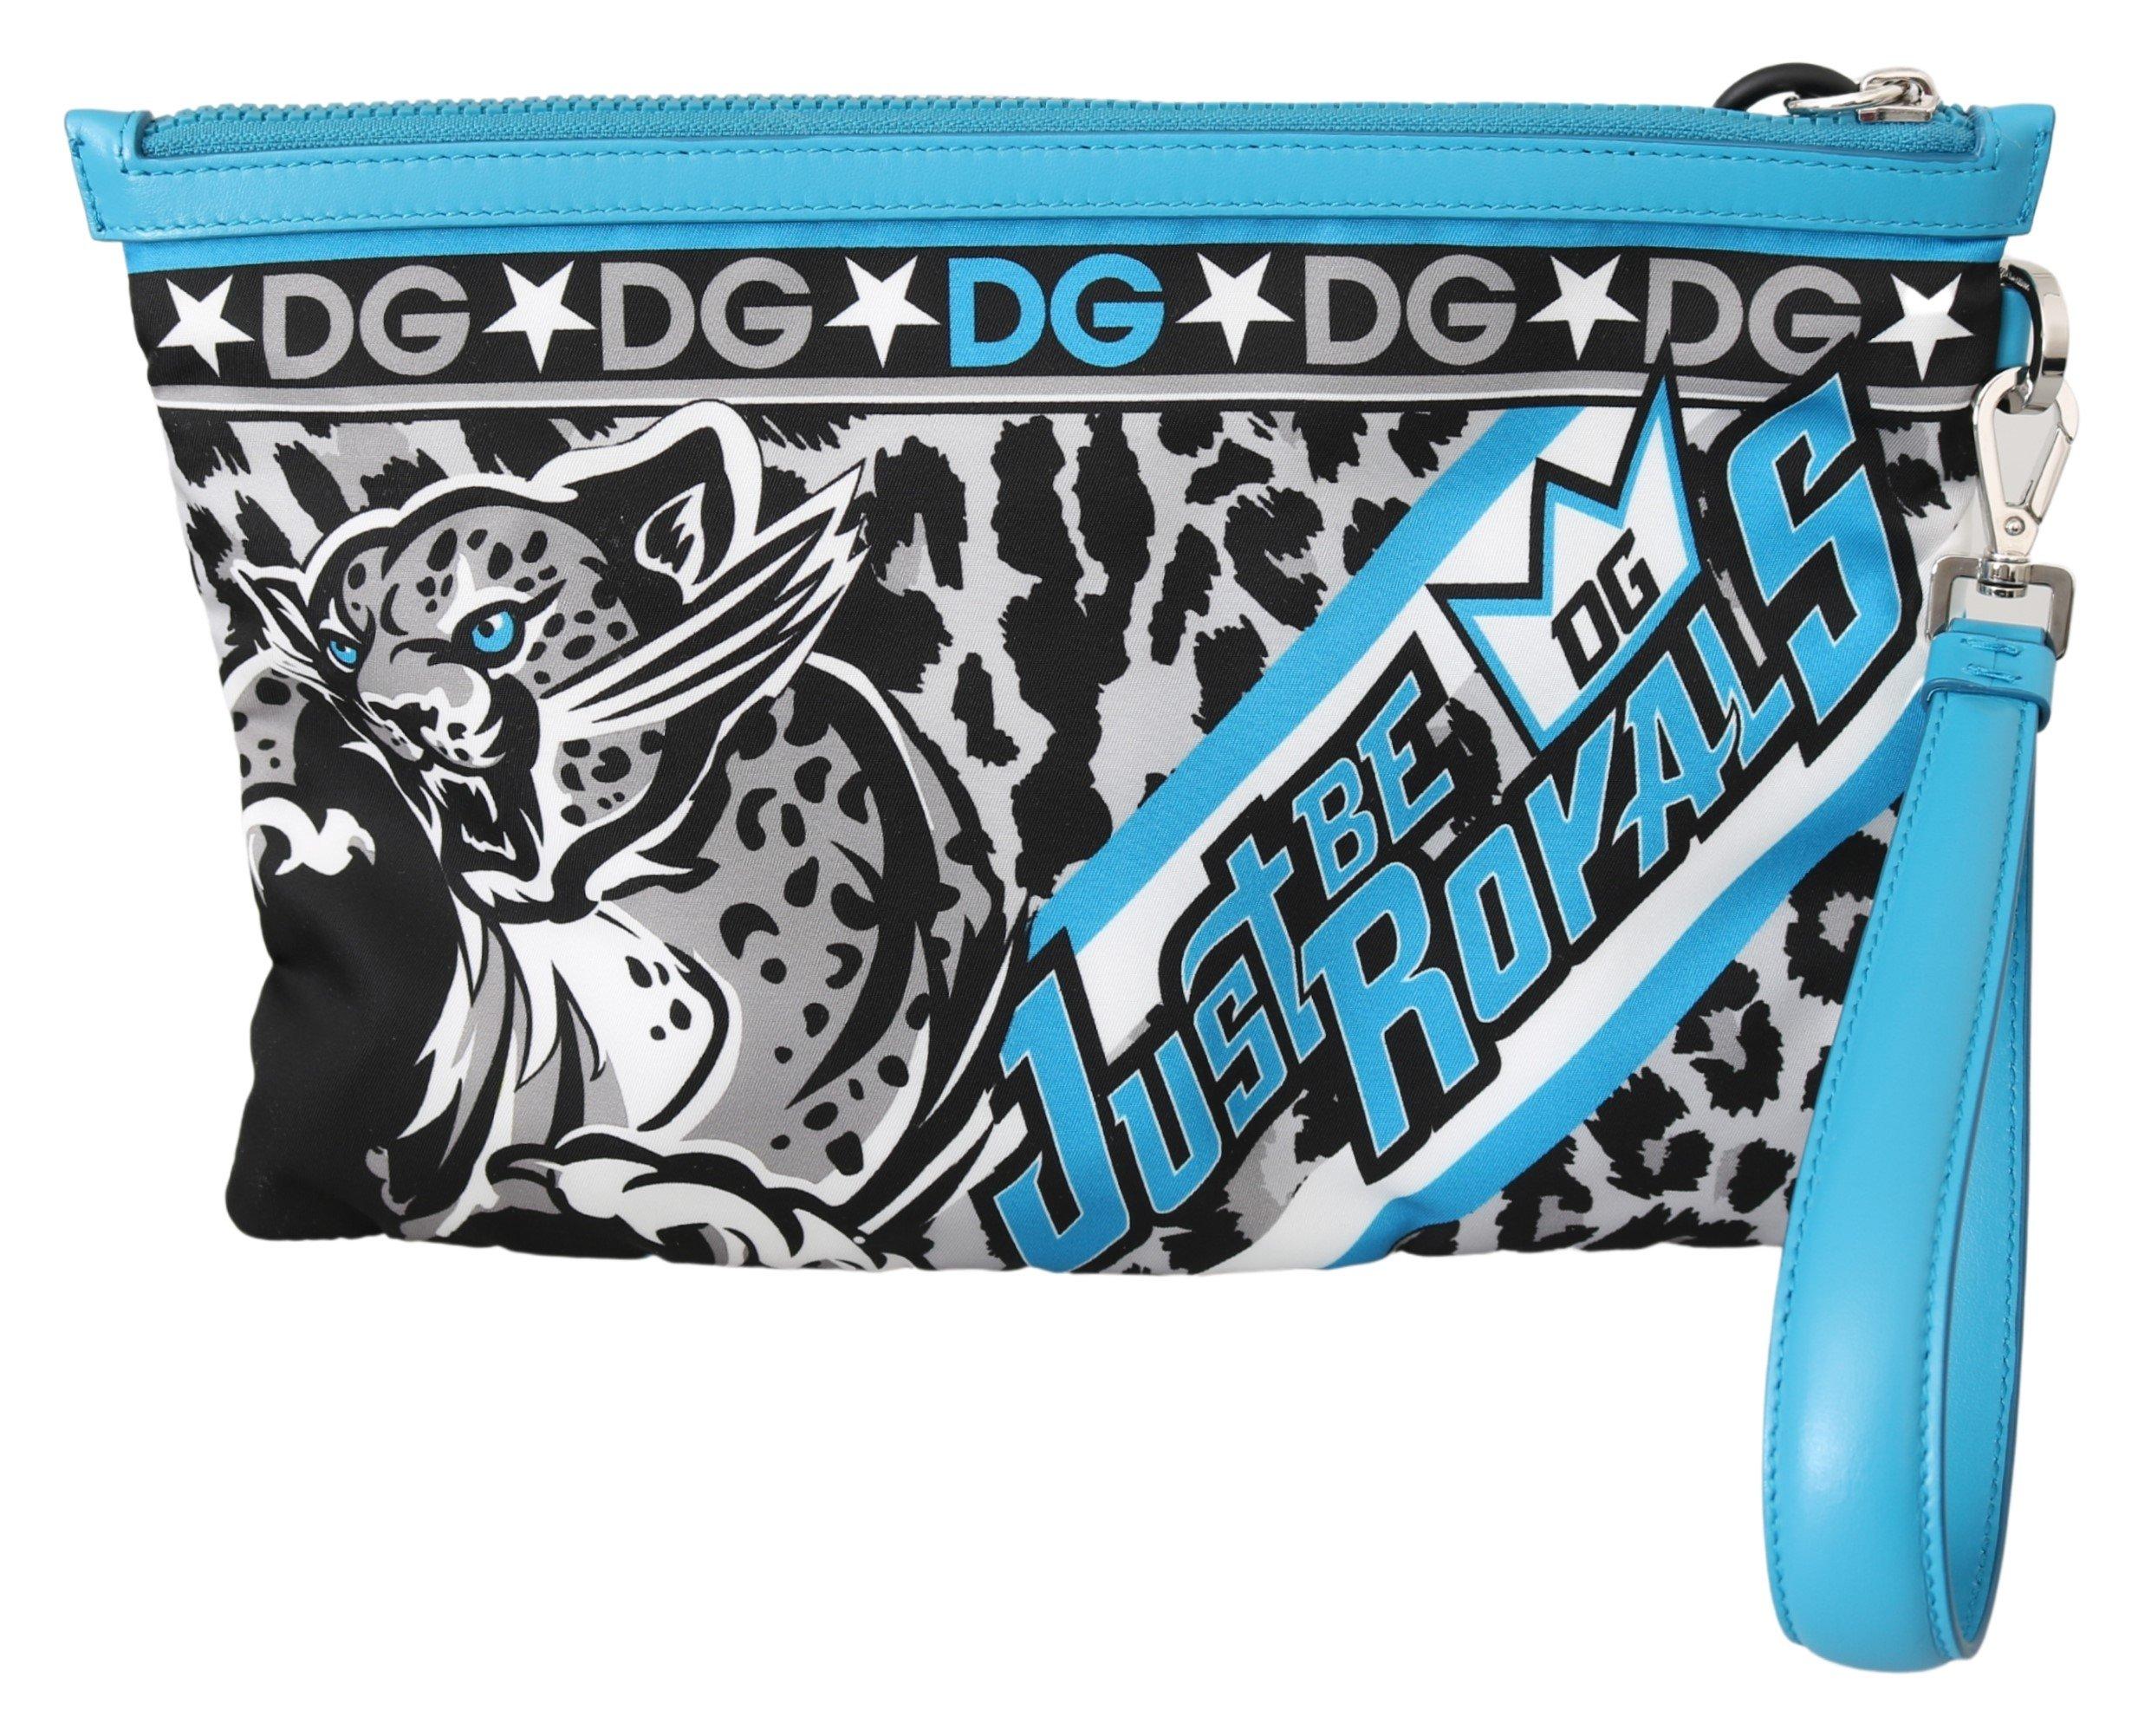 Dolce & Gabbana Women's Tiger Wrist Strap Wallet Multicolor VAS10055